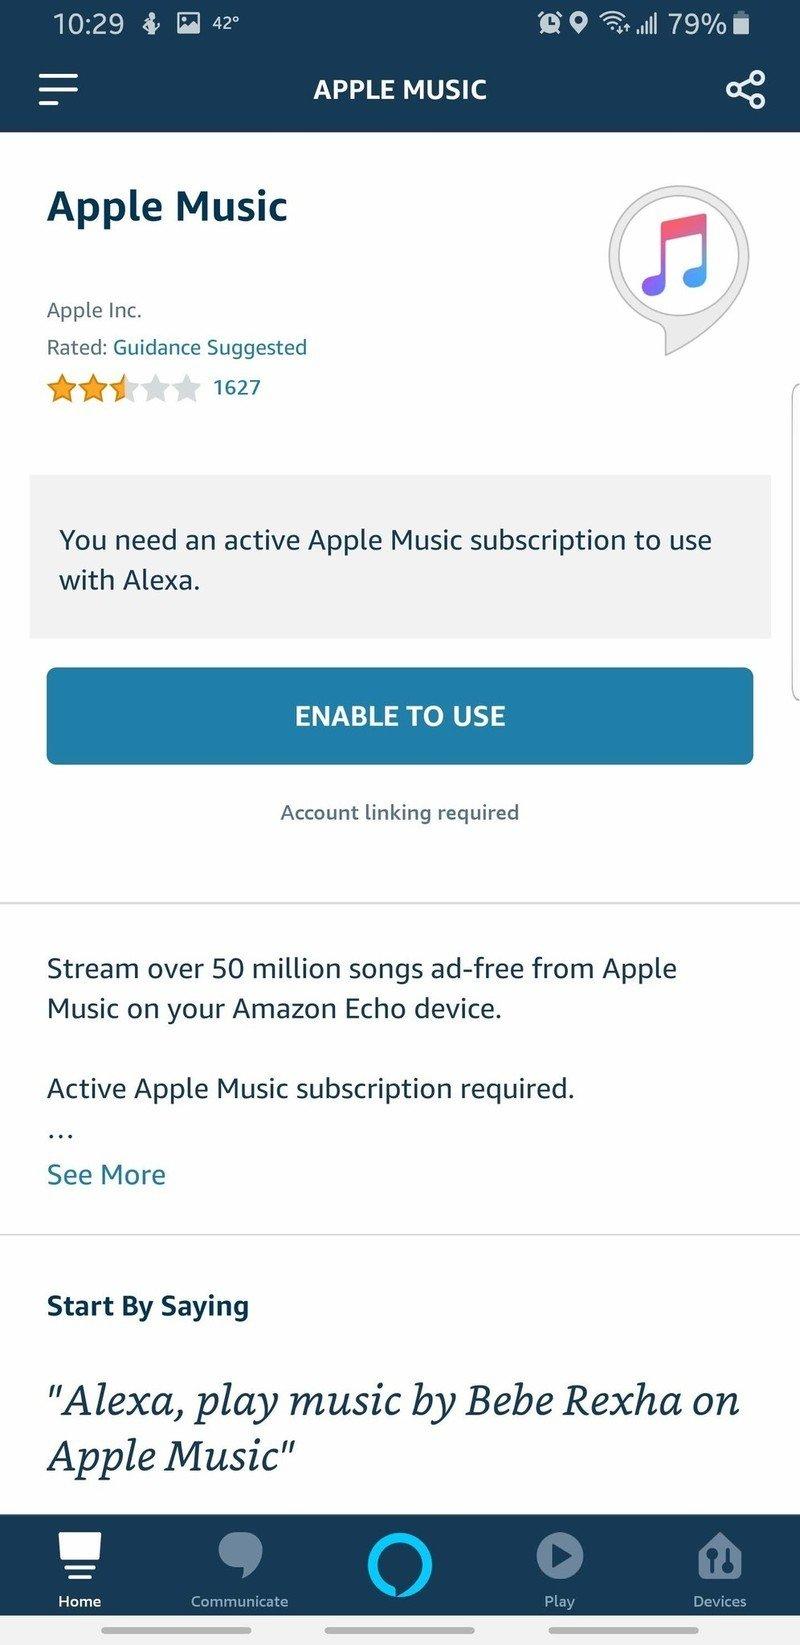 amazon-echo-apple-music-7.jpg?itok=R-gtM